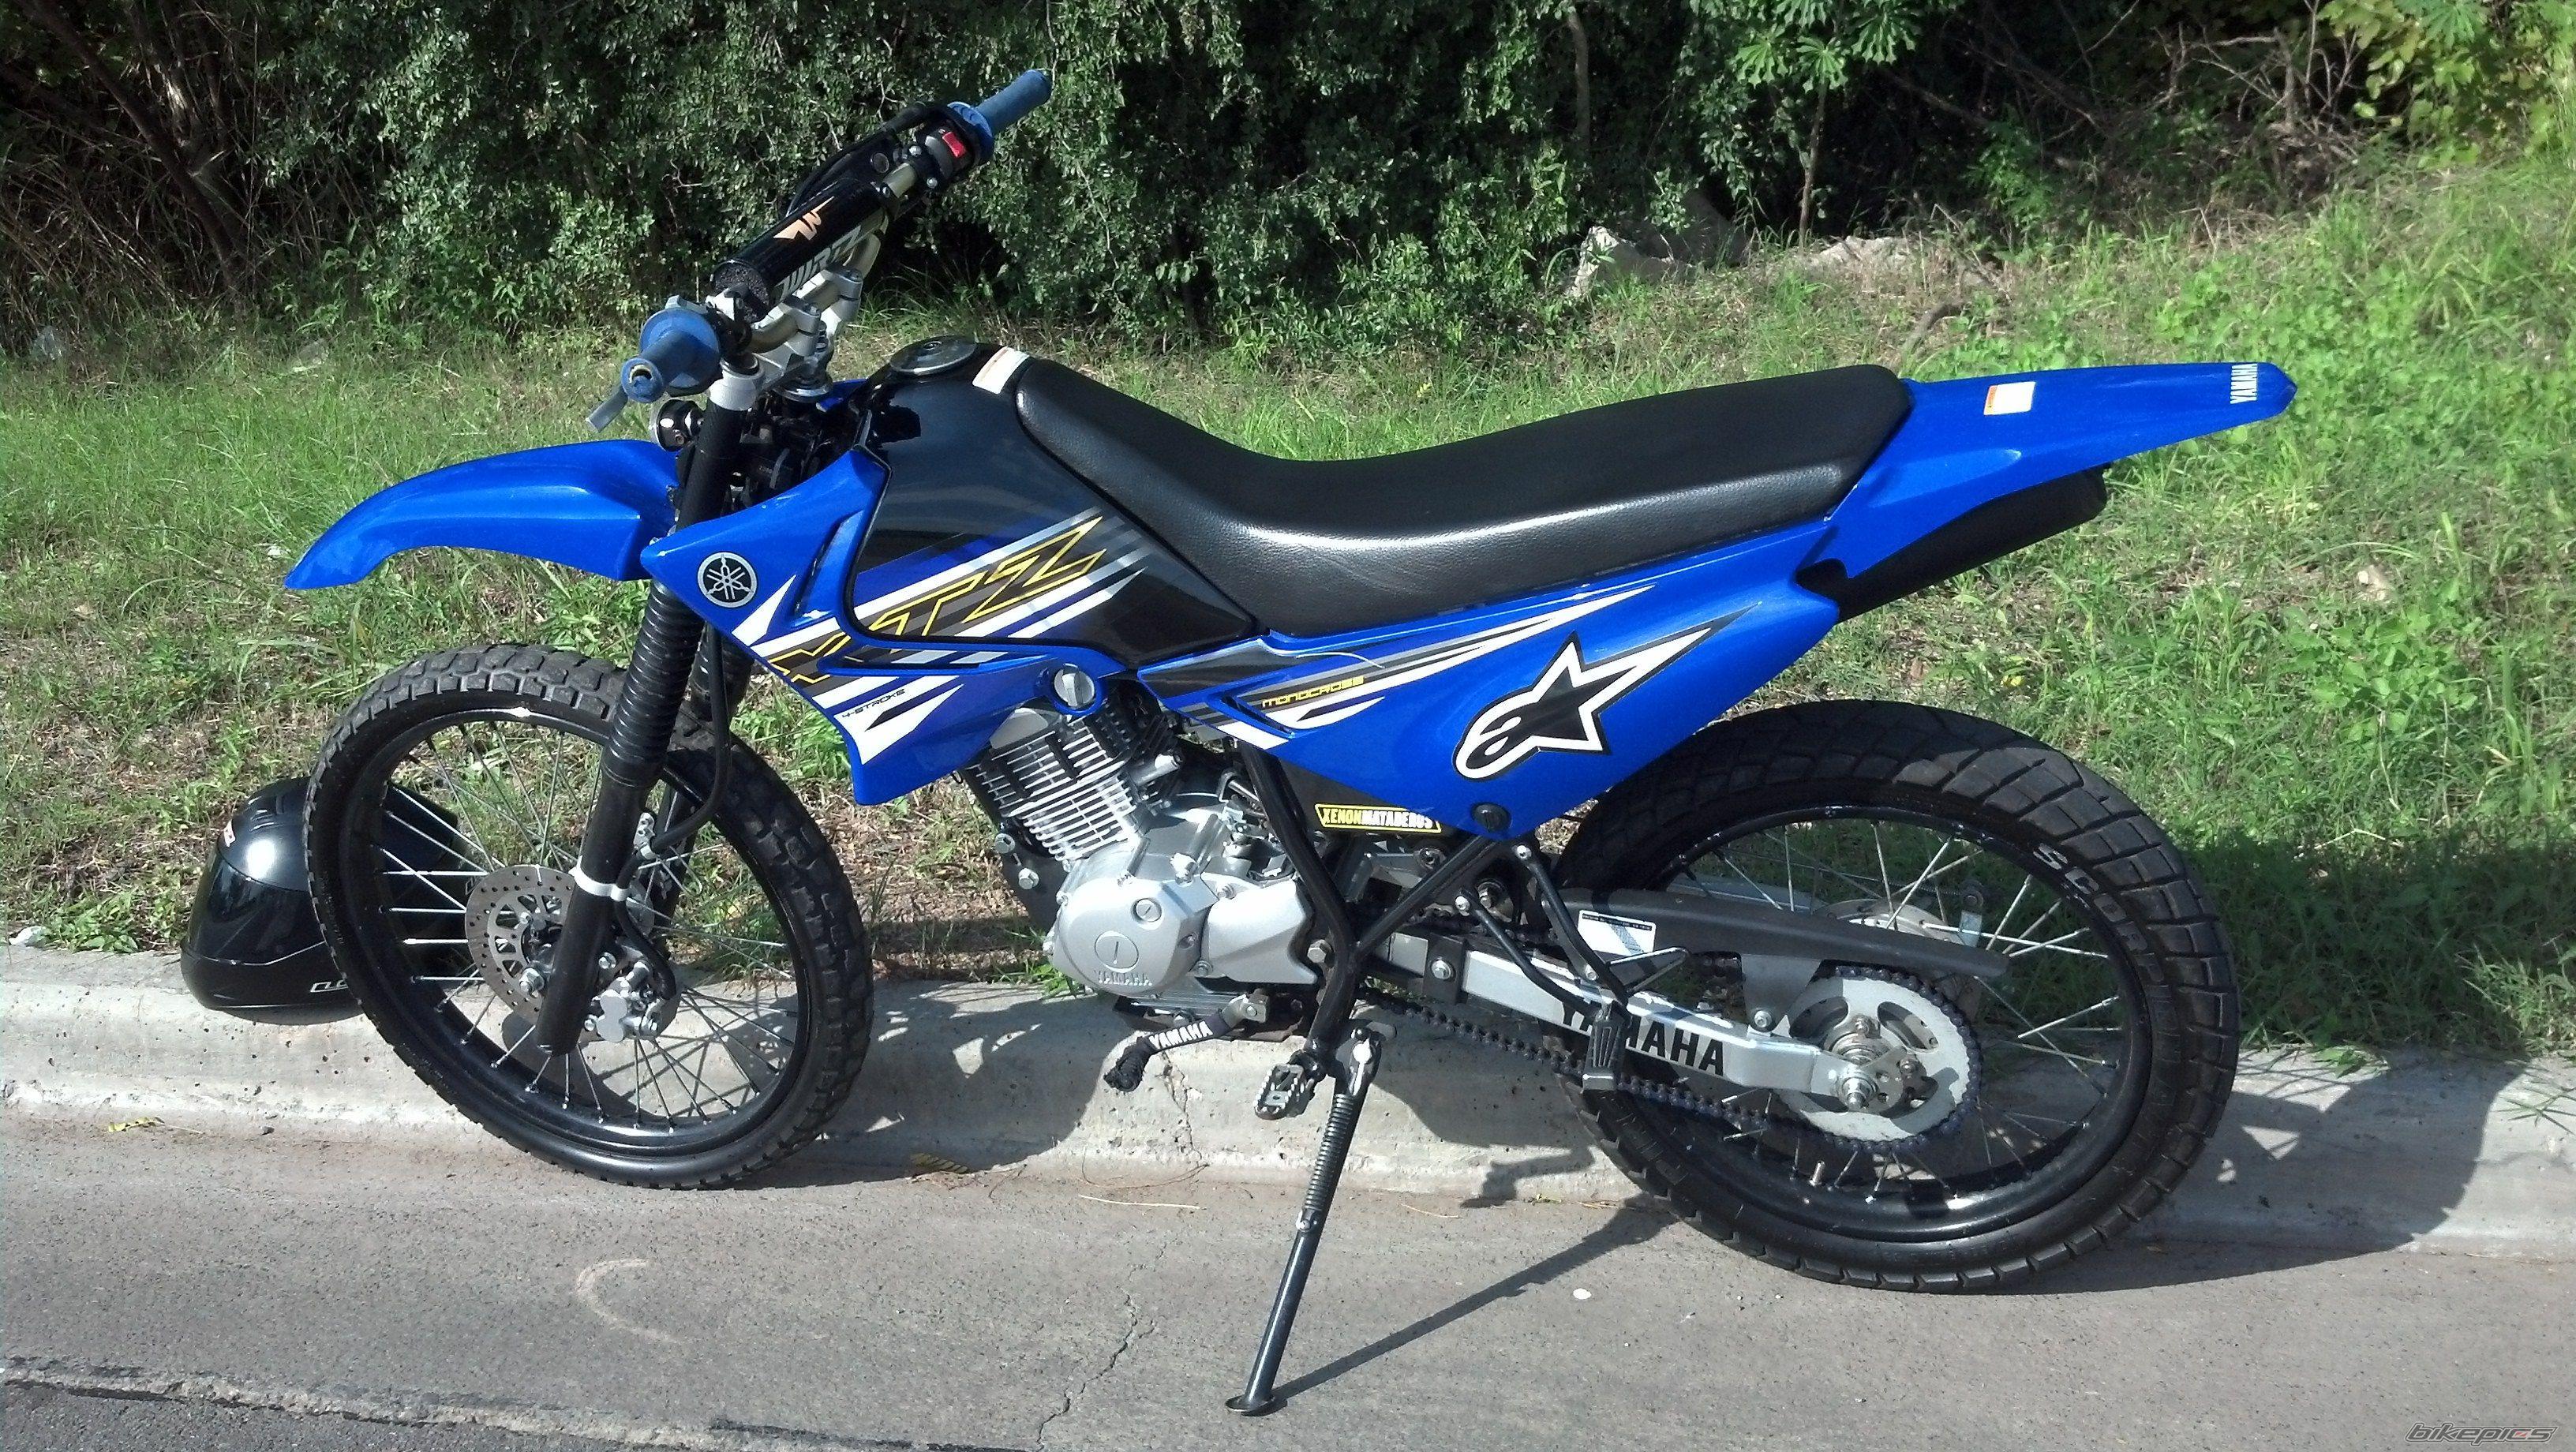 2014 yamaha xtz 125 motorcycle photo motos deportivas for Yamaha xtz 125